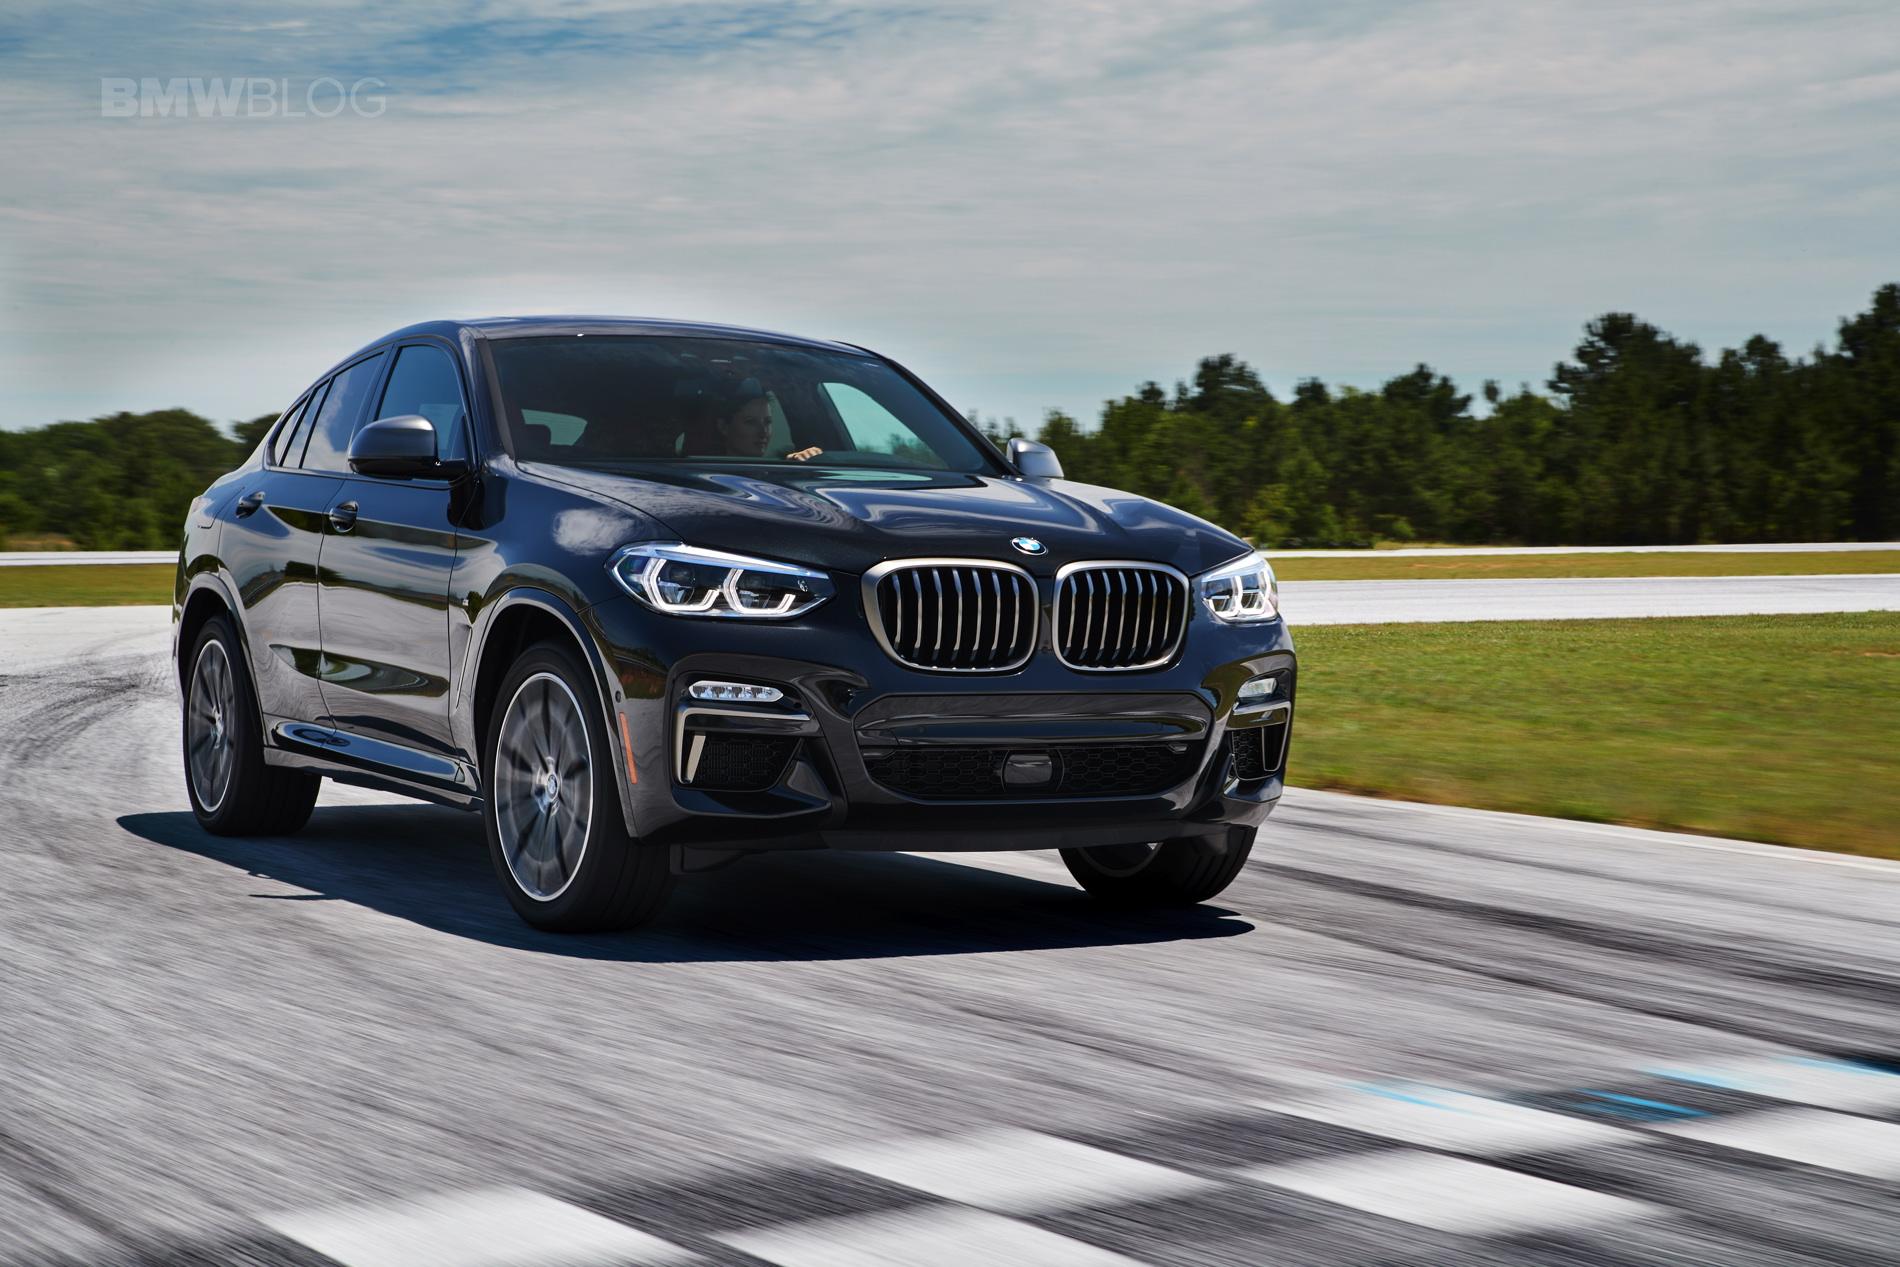 2019 G02 BMW X4 M40i test drive 01